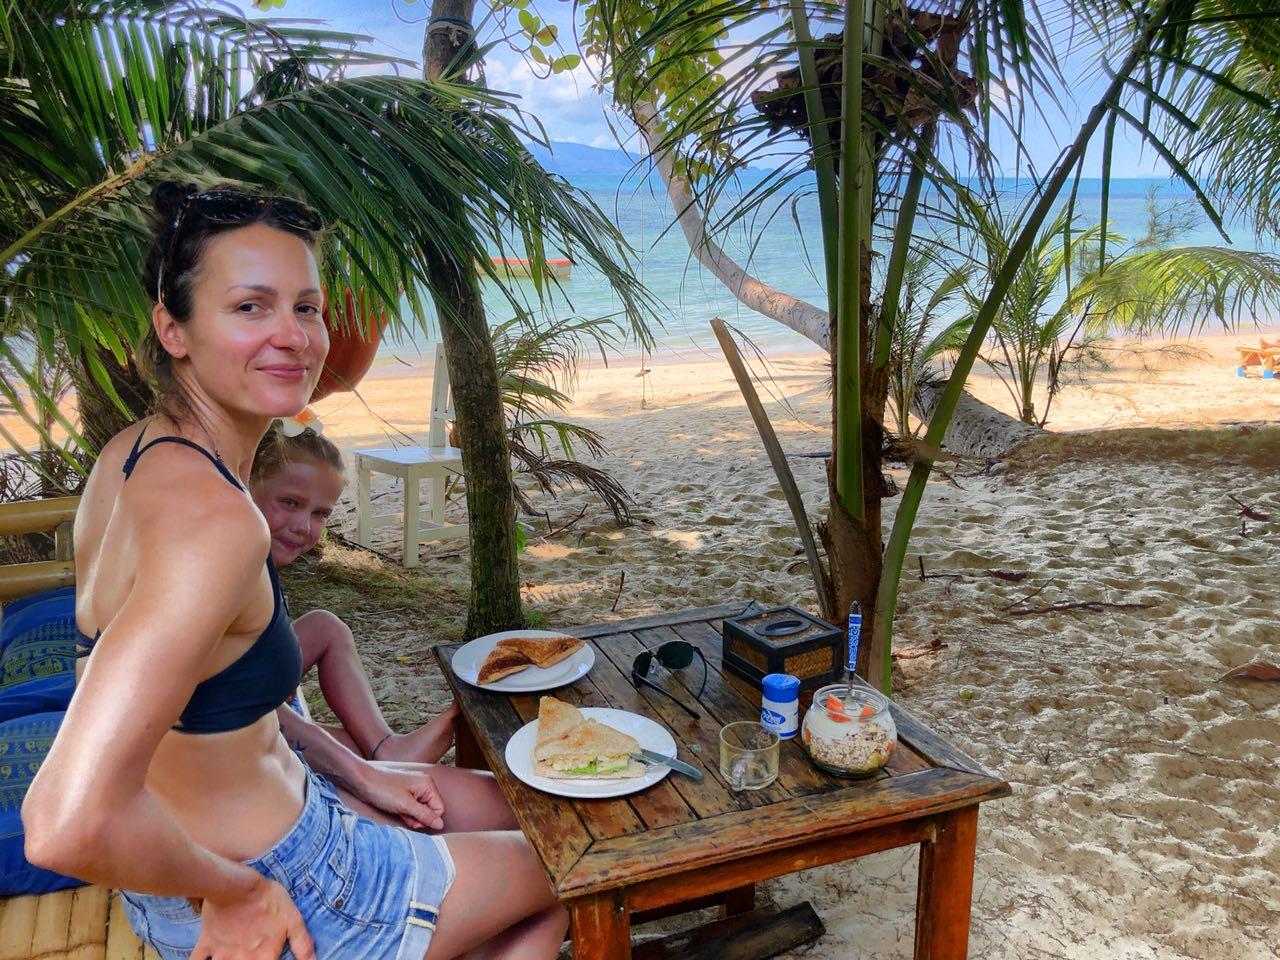 Frühstück am Strand, Silvermoohn Jungle Resort, Klo Phangan, Thiailand